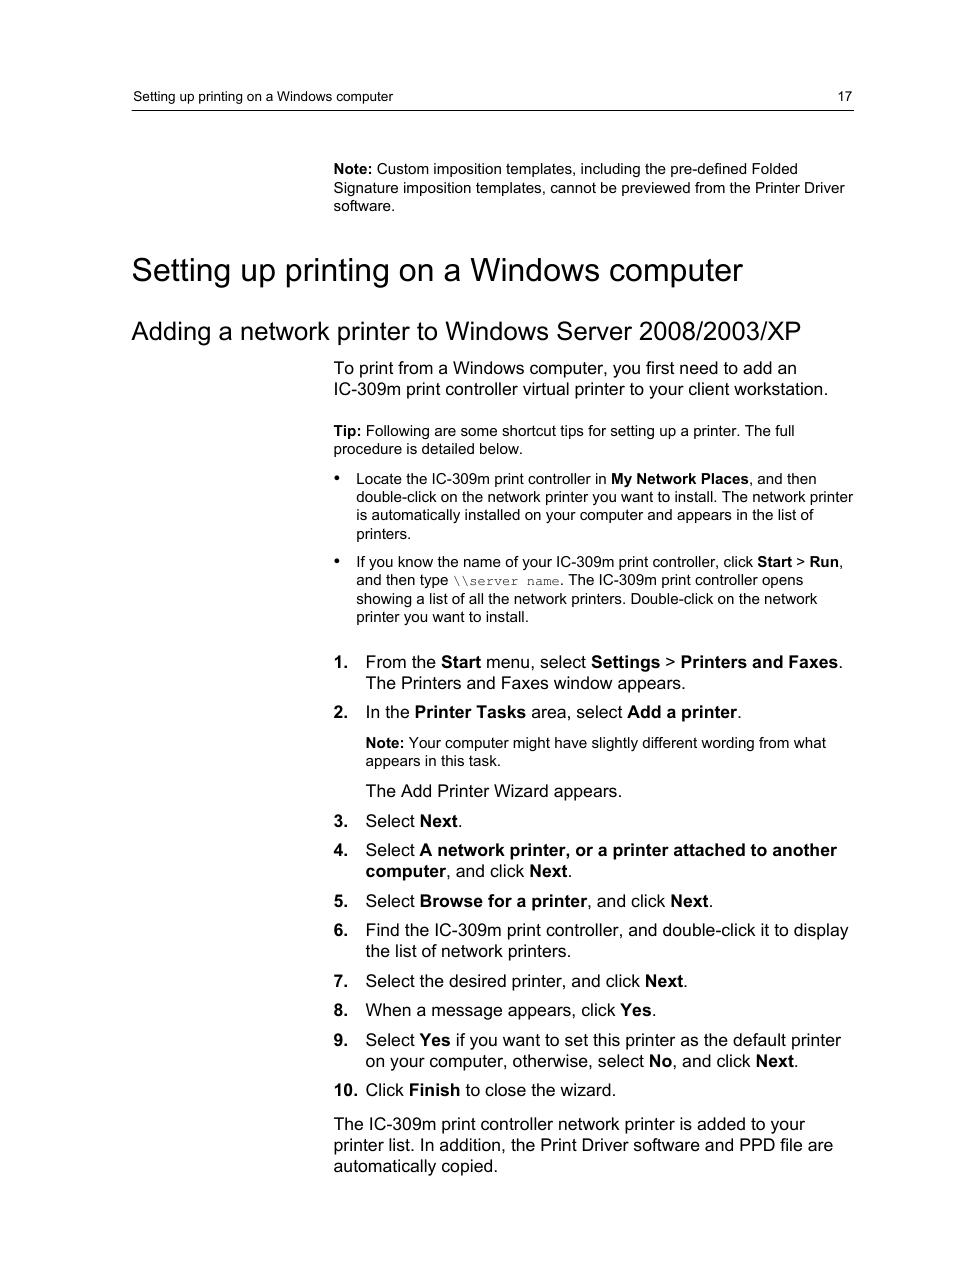 Setting up printing on a windows computer   Konica Minolta bizhub